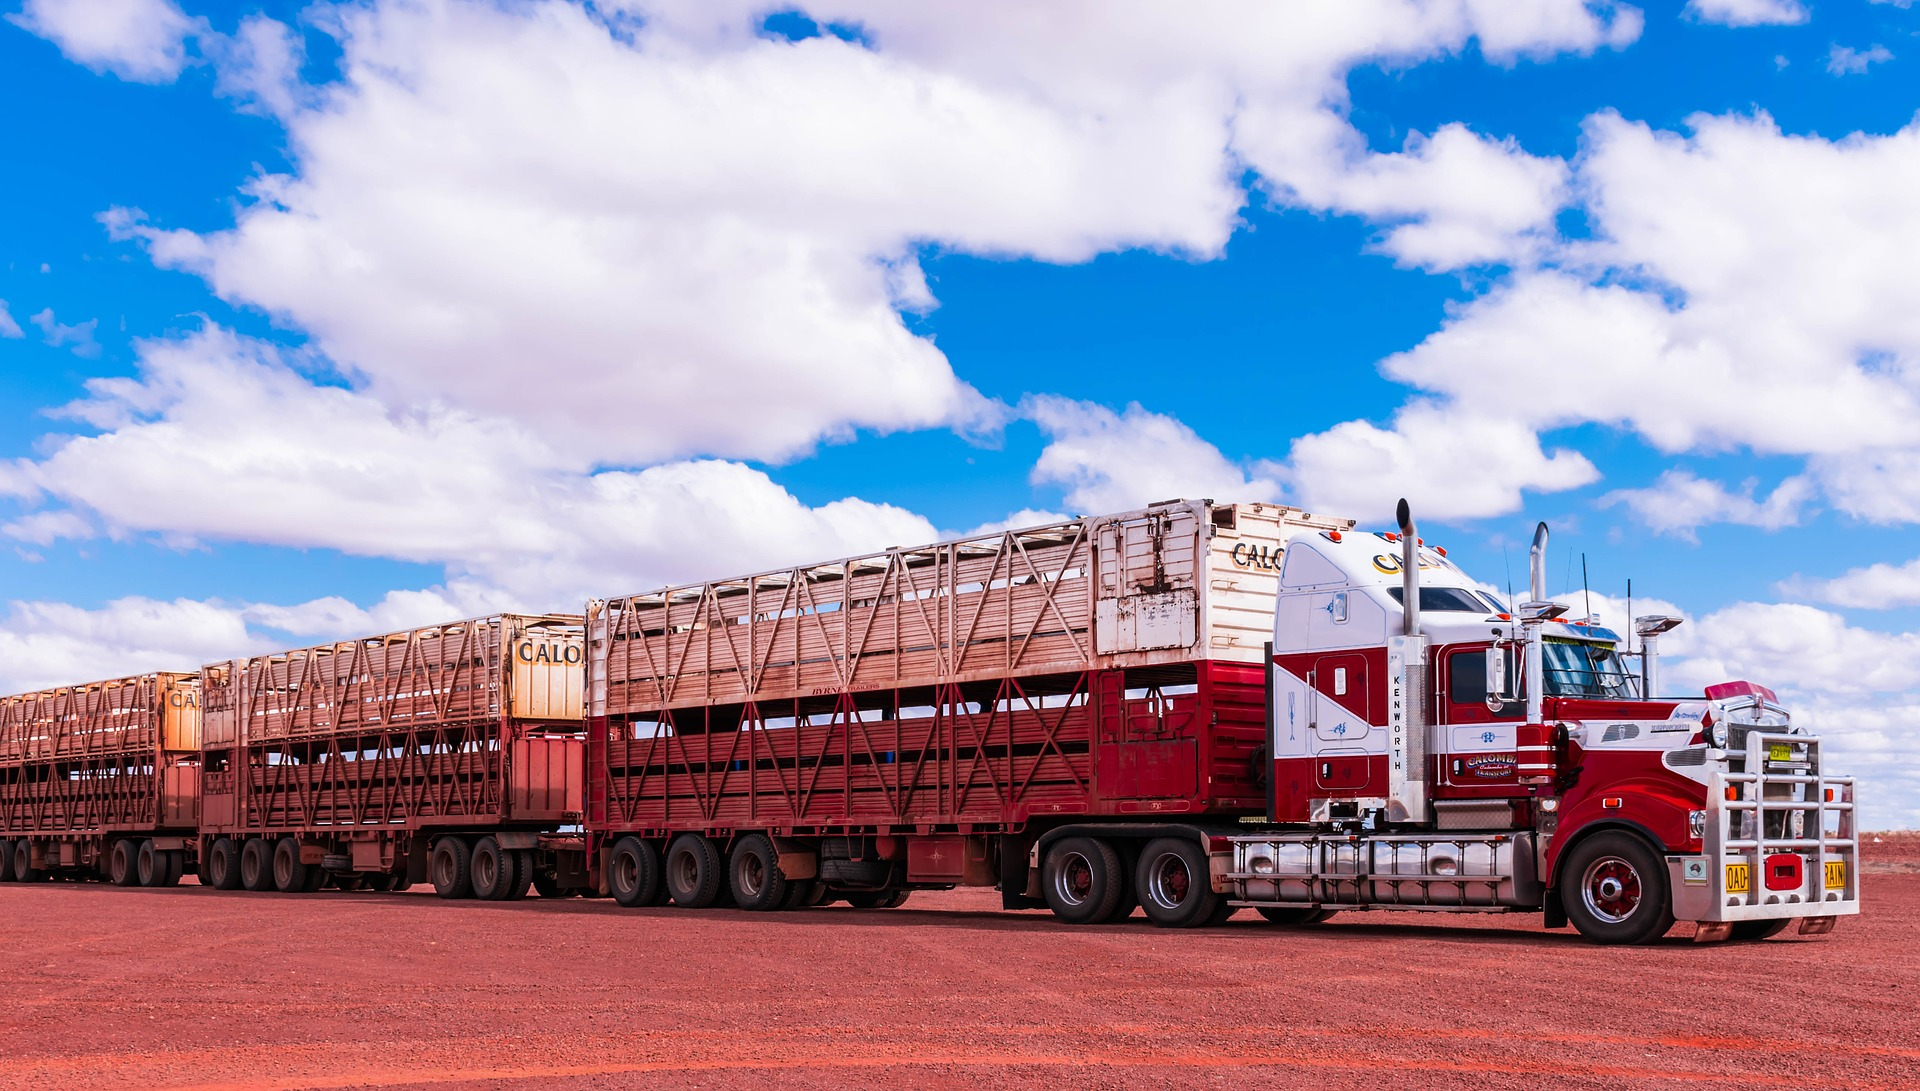 A screen showing a transport truck.